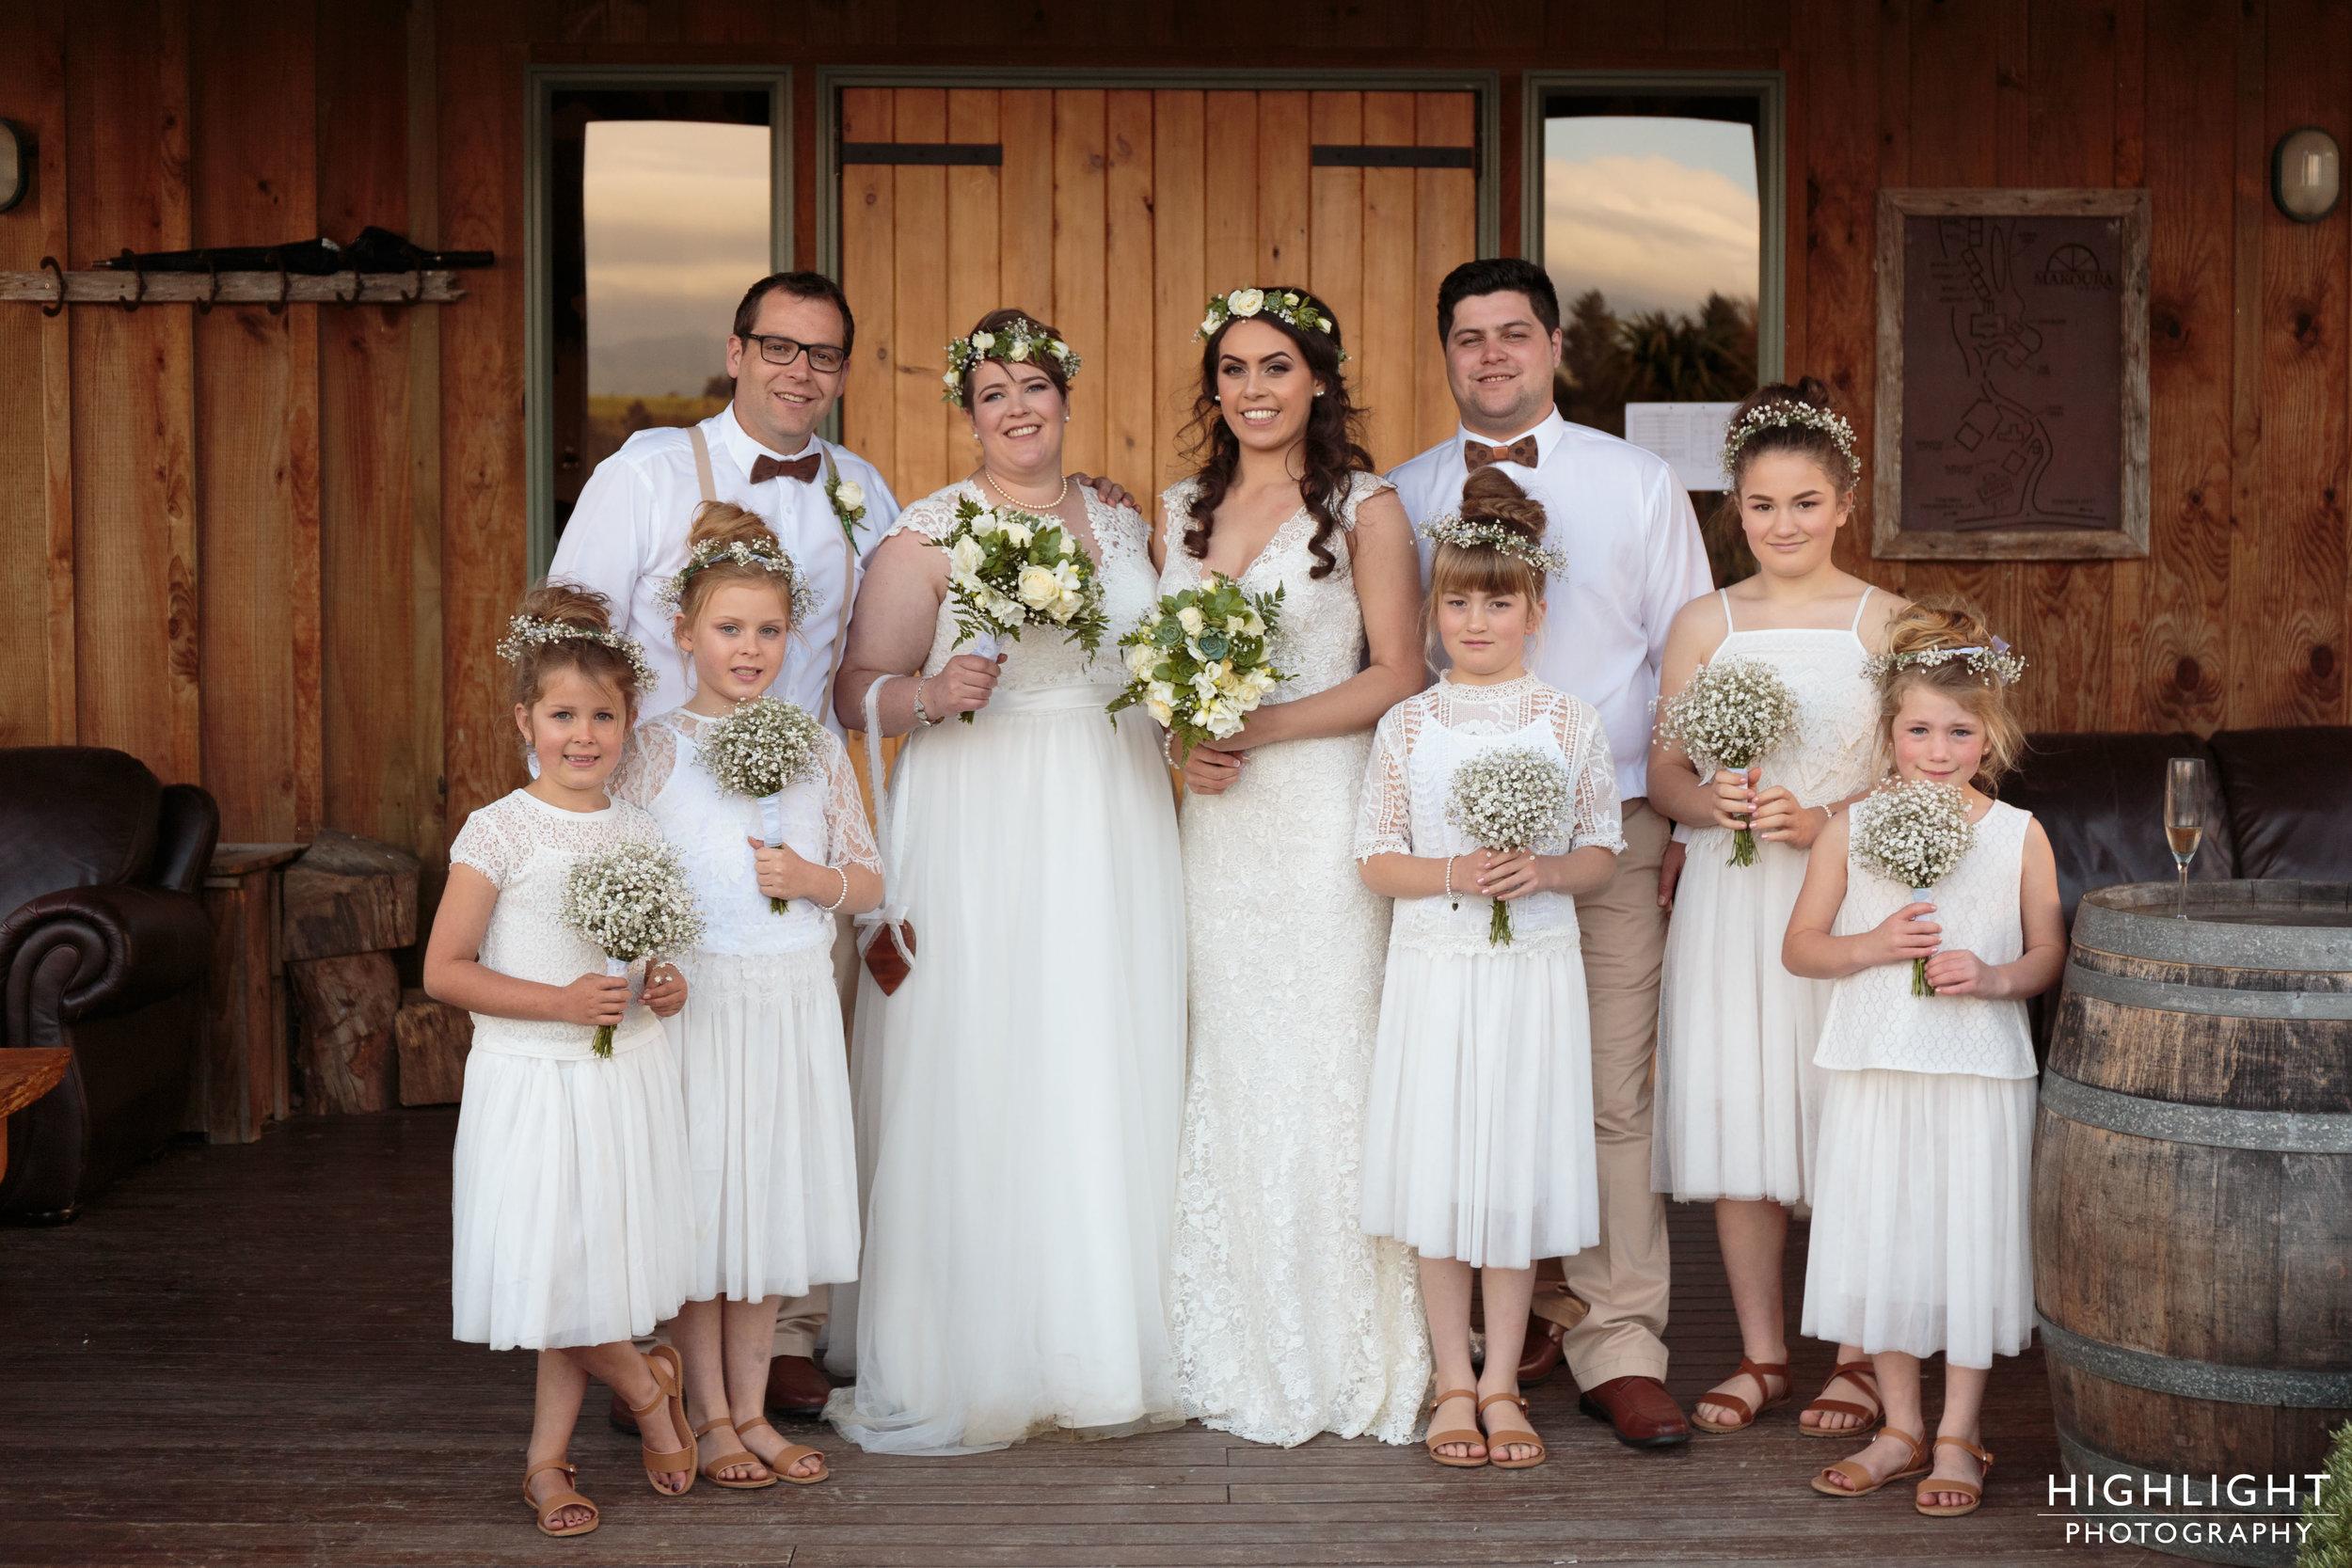 highlight_wedding_photography_makoura_lodge_manawatu_new_zealand-134.jpg